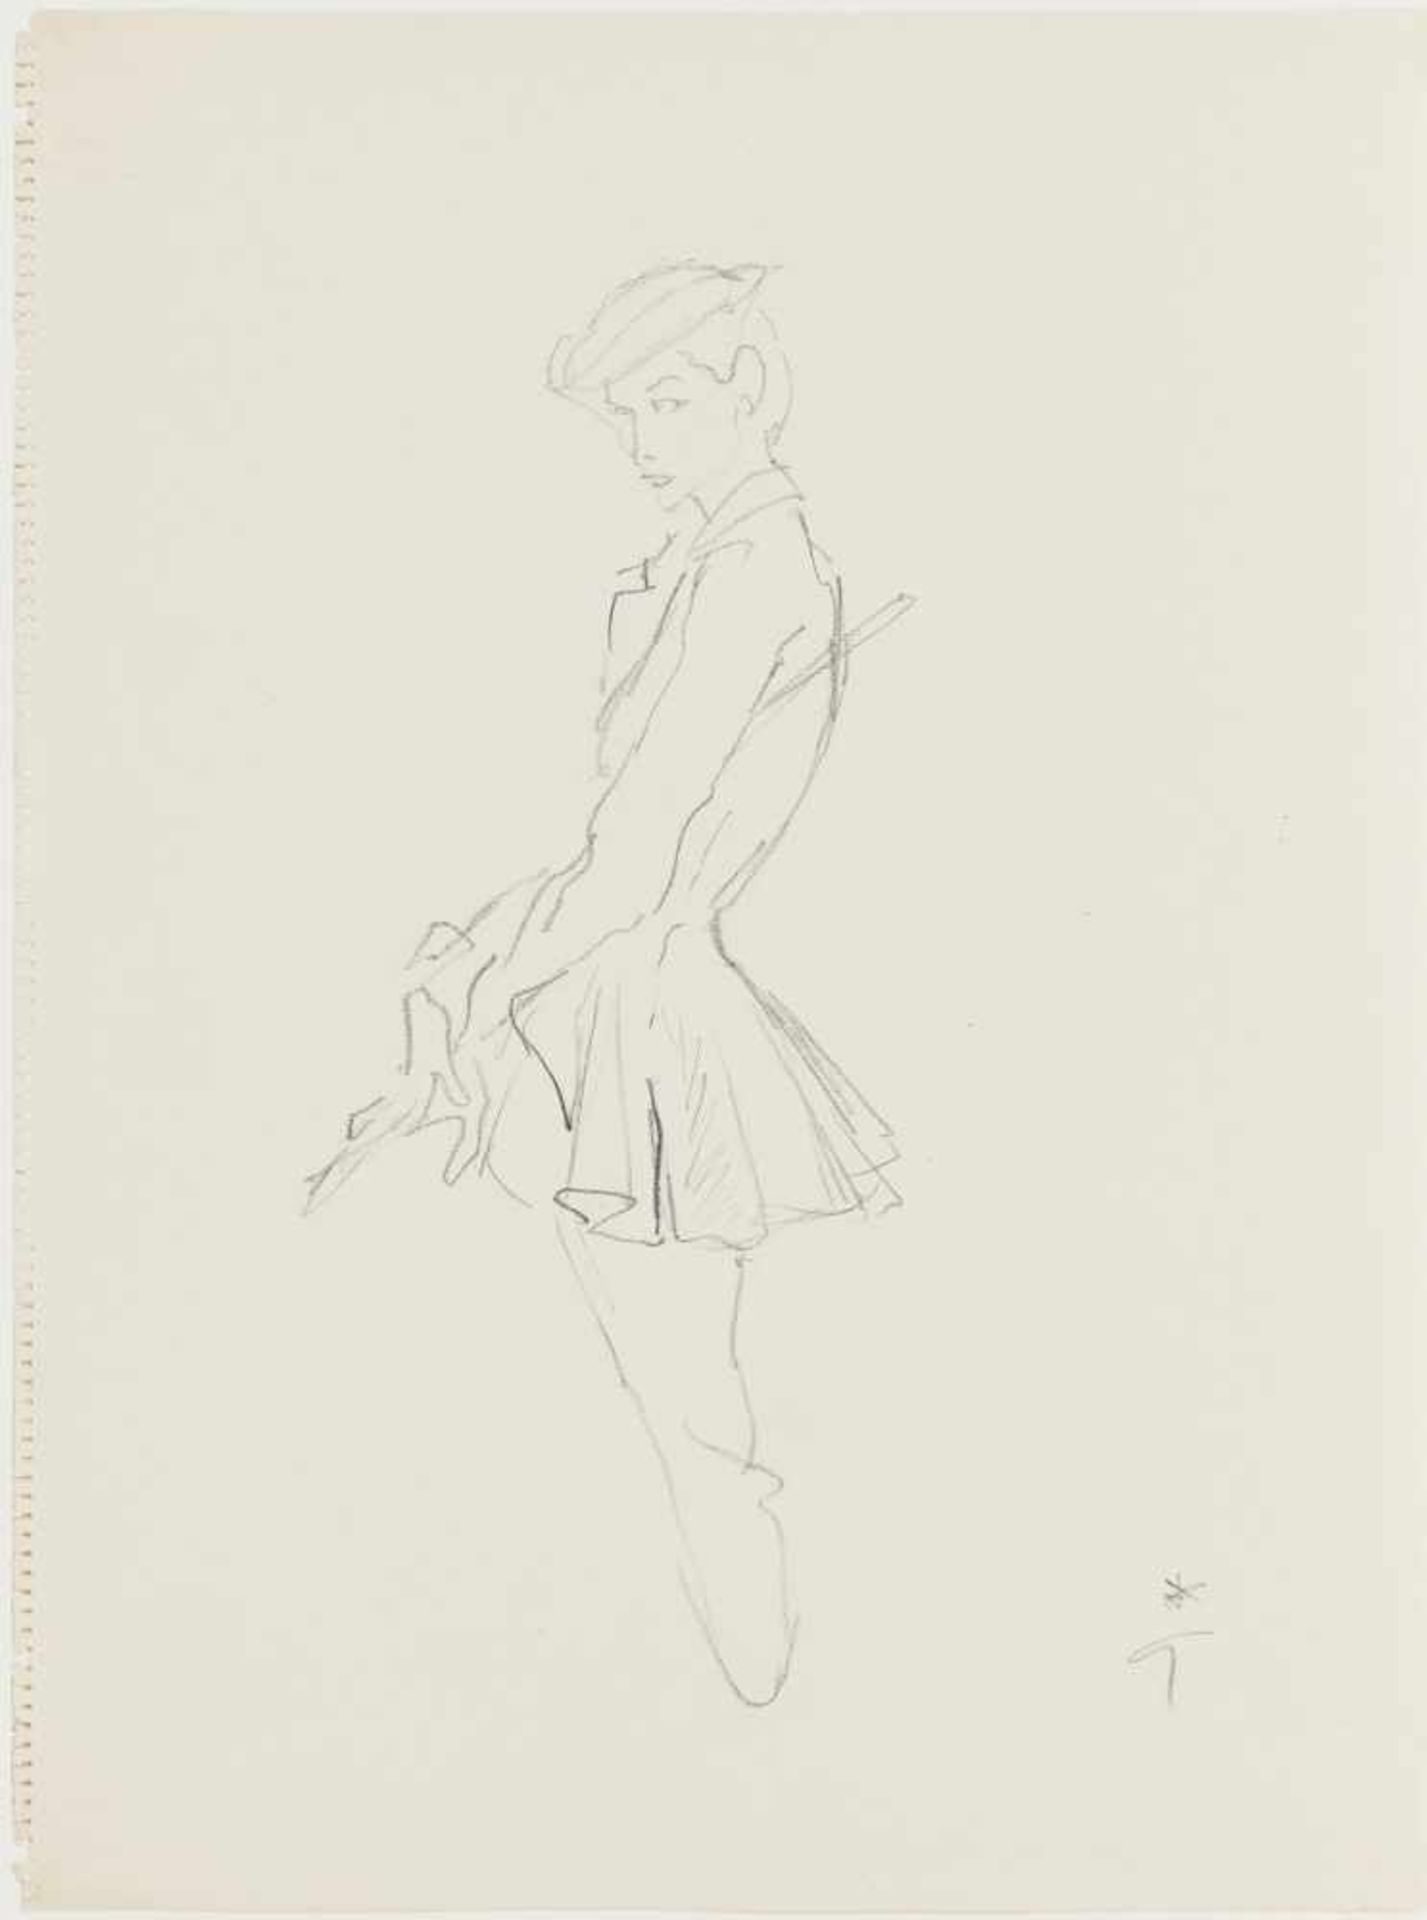 Gruau, René1909 Rome - 2004 Rome Fashion Illustration for Jaques Fath. C. 1951/52 Signed lower